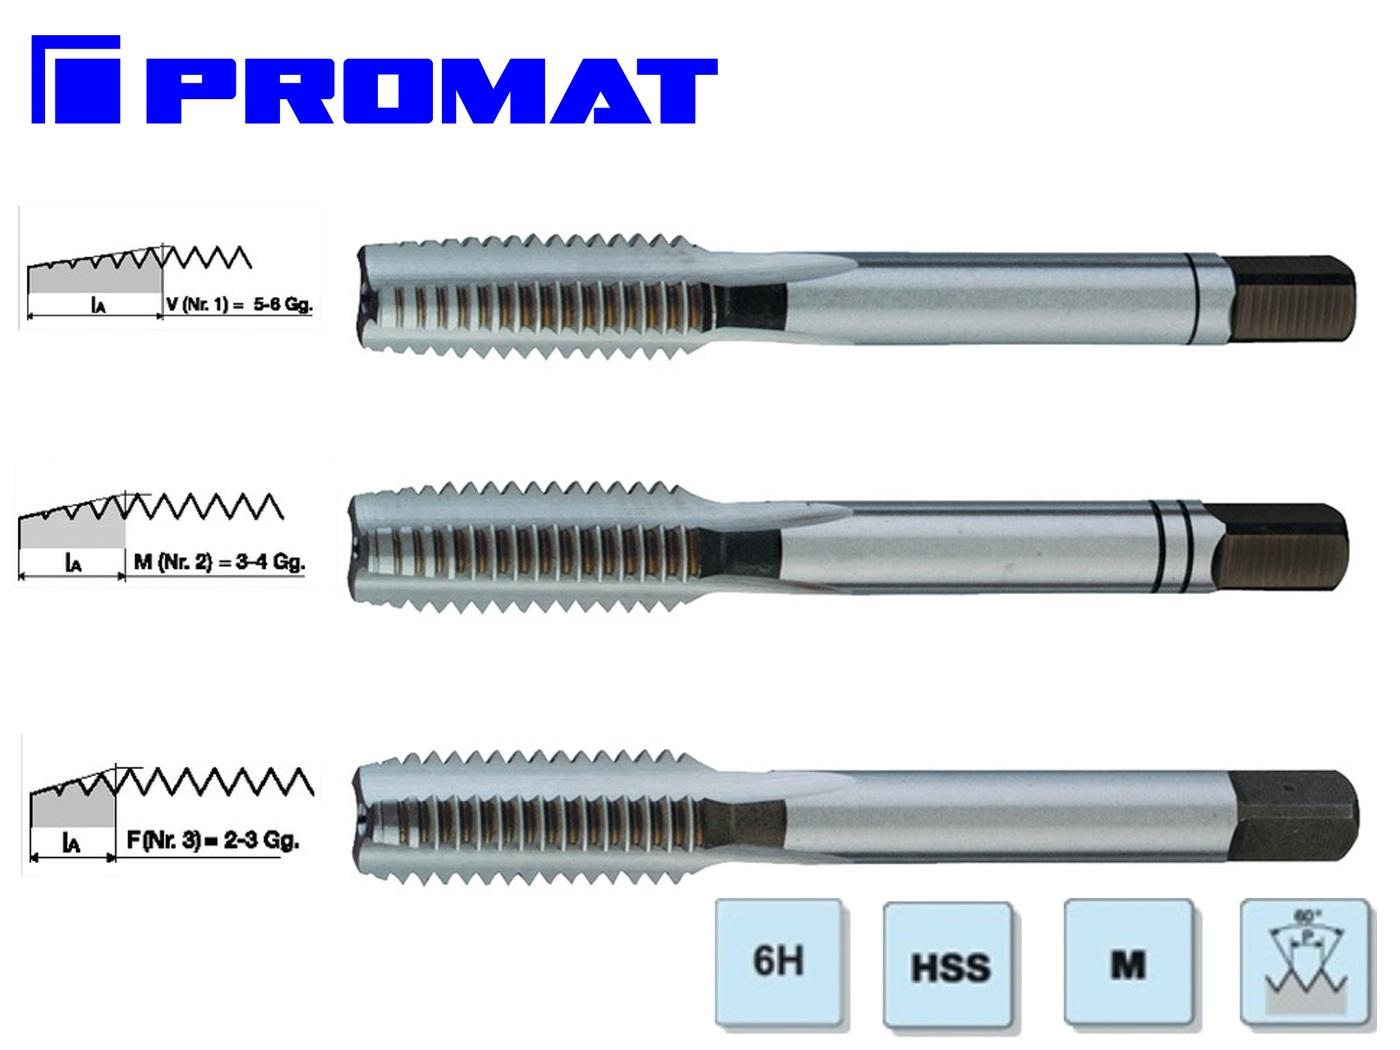 Handtappenset DIN352 HSS PROMAT   DKMTools - DKM Tools